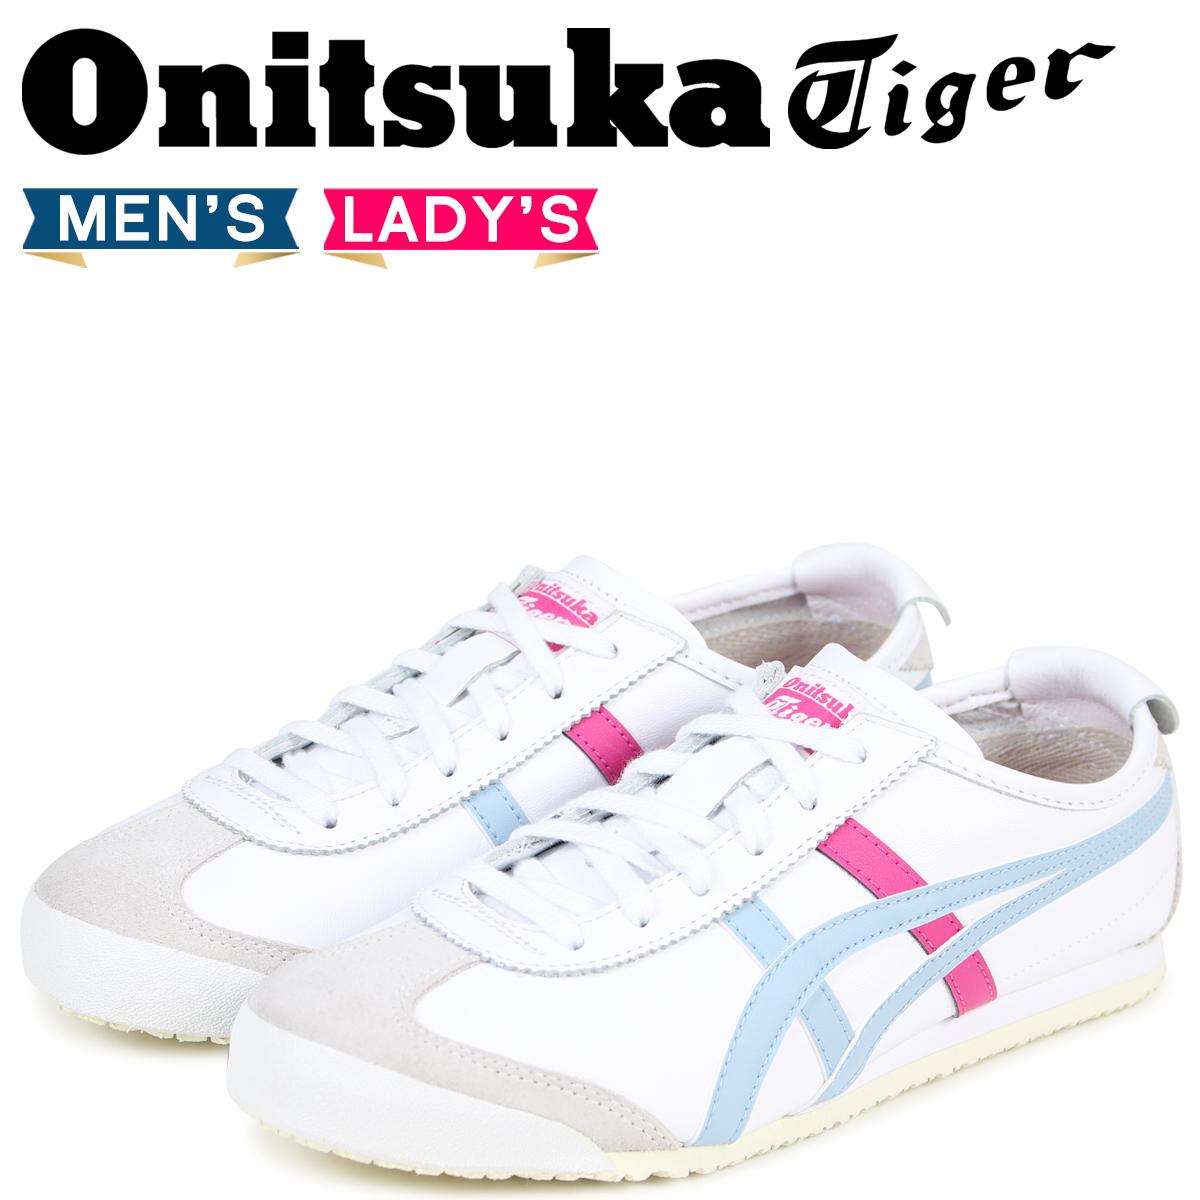 Onitsuka Tiger メキシコ 66 オニツカタイガー MEXICO 66 メンズ レディース スニーカー D4J2L-0140 TH4J2L-0140 ホワイト